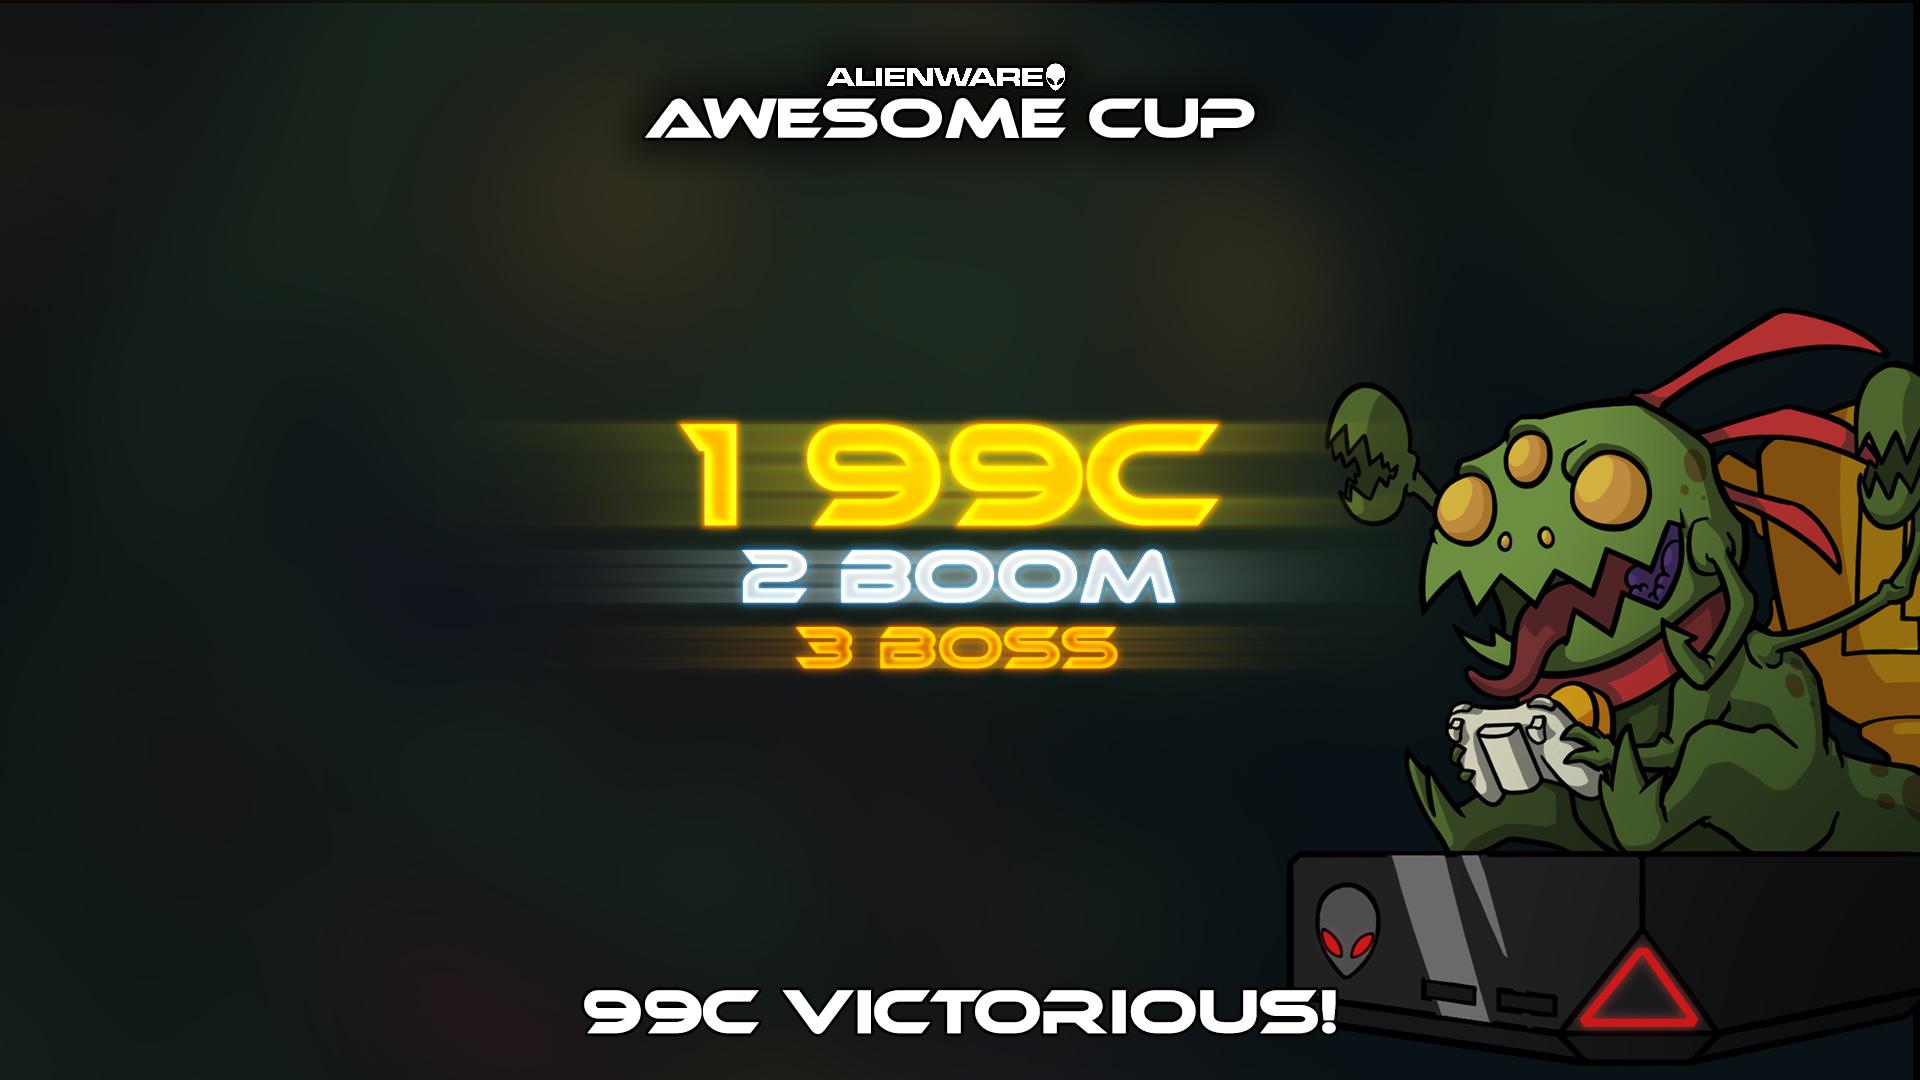 awesomecupwinner